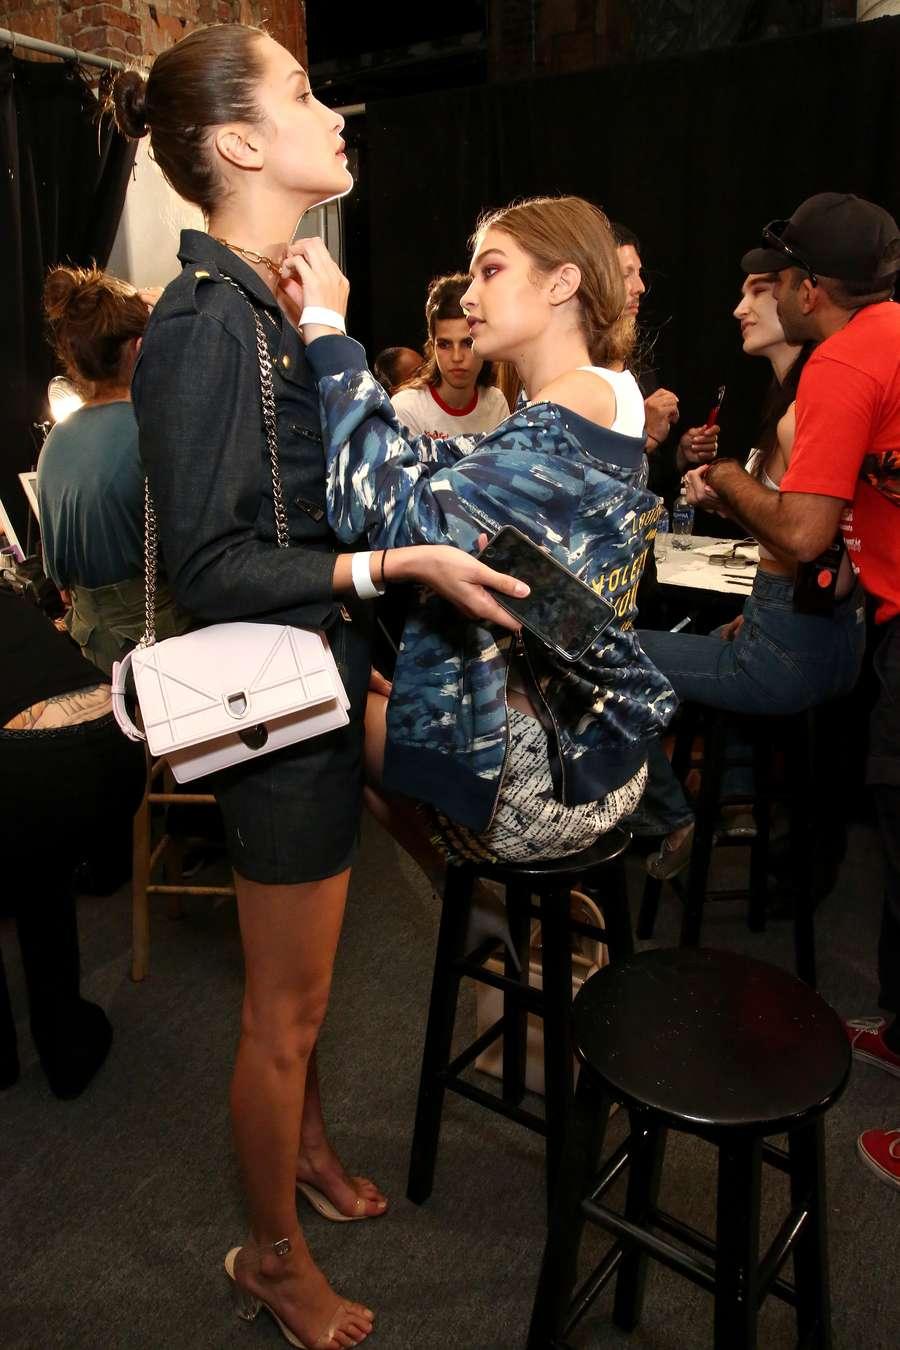 Mengintip Gigi Hadid di Backstage New York Fashion Week